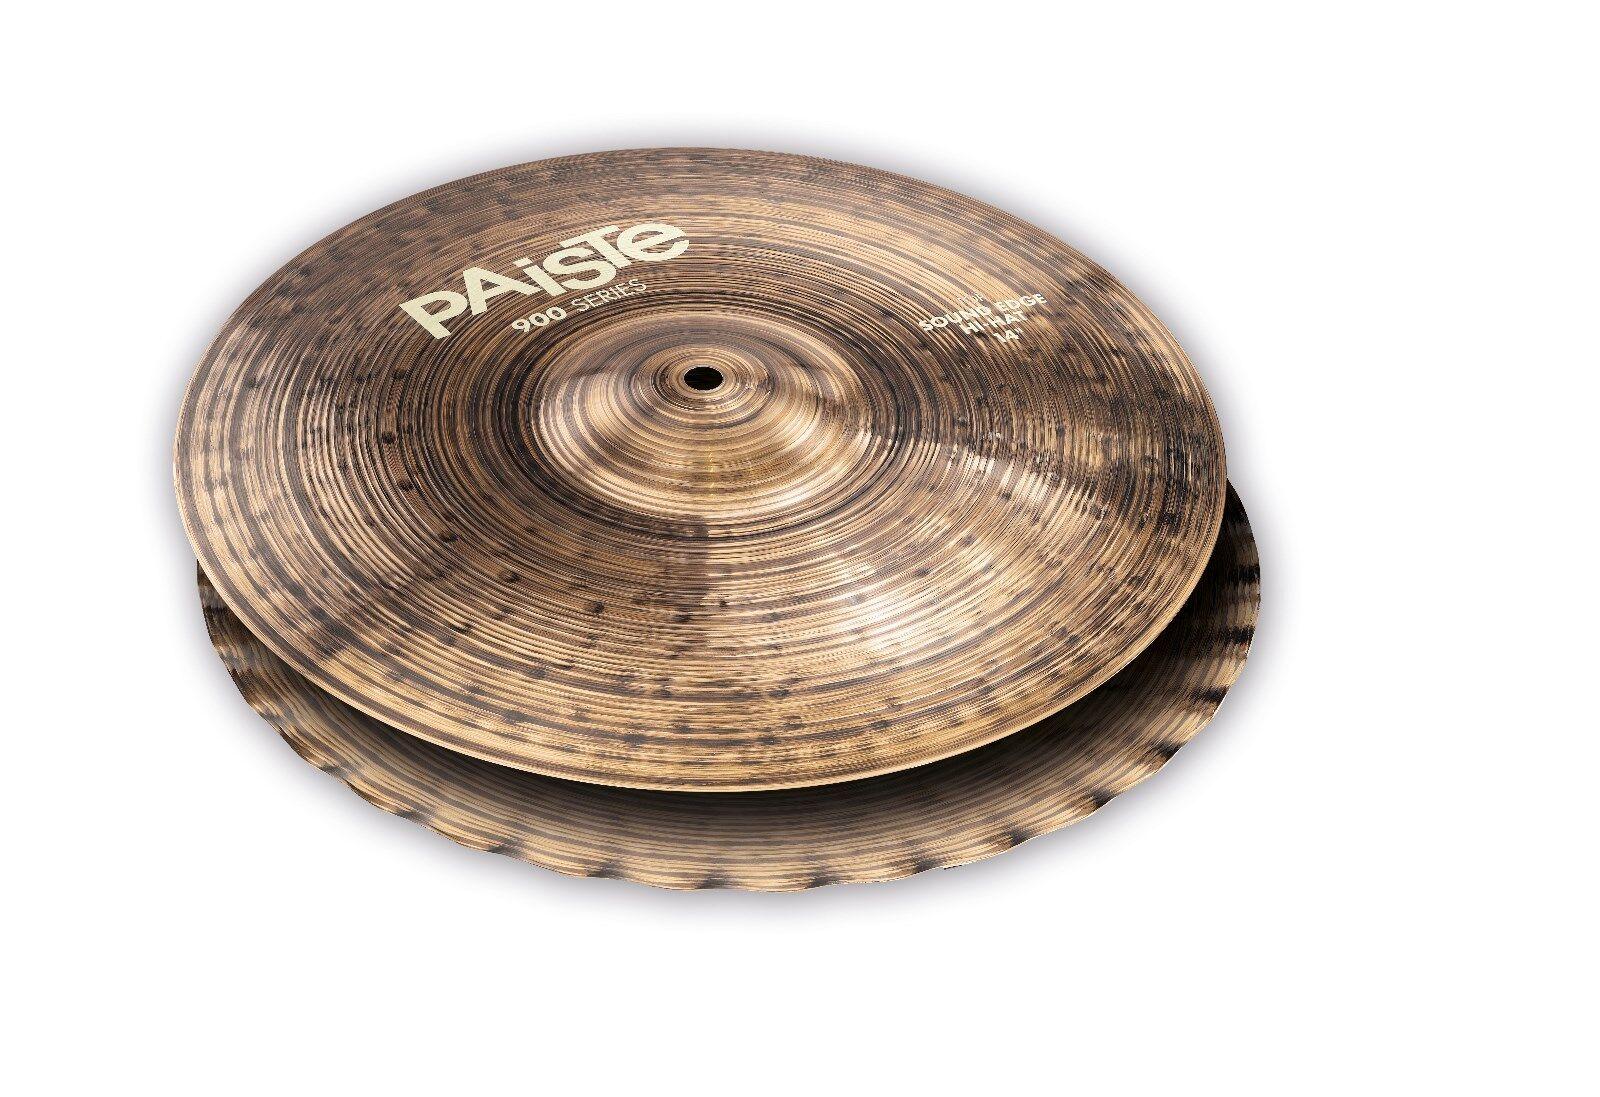 Paiste Farbe Sound 900 14  Sound Edge Hi Hat Cymbals Free Stick Bag-Sticks